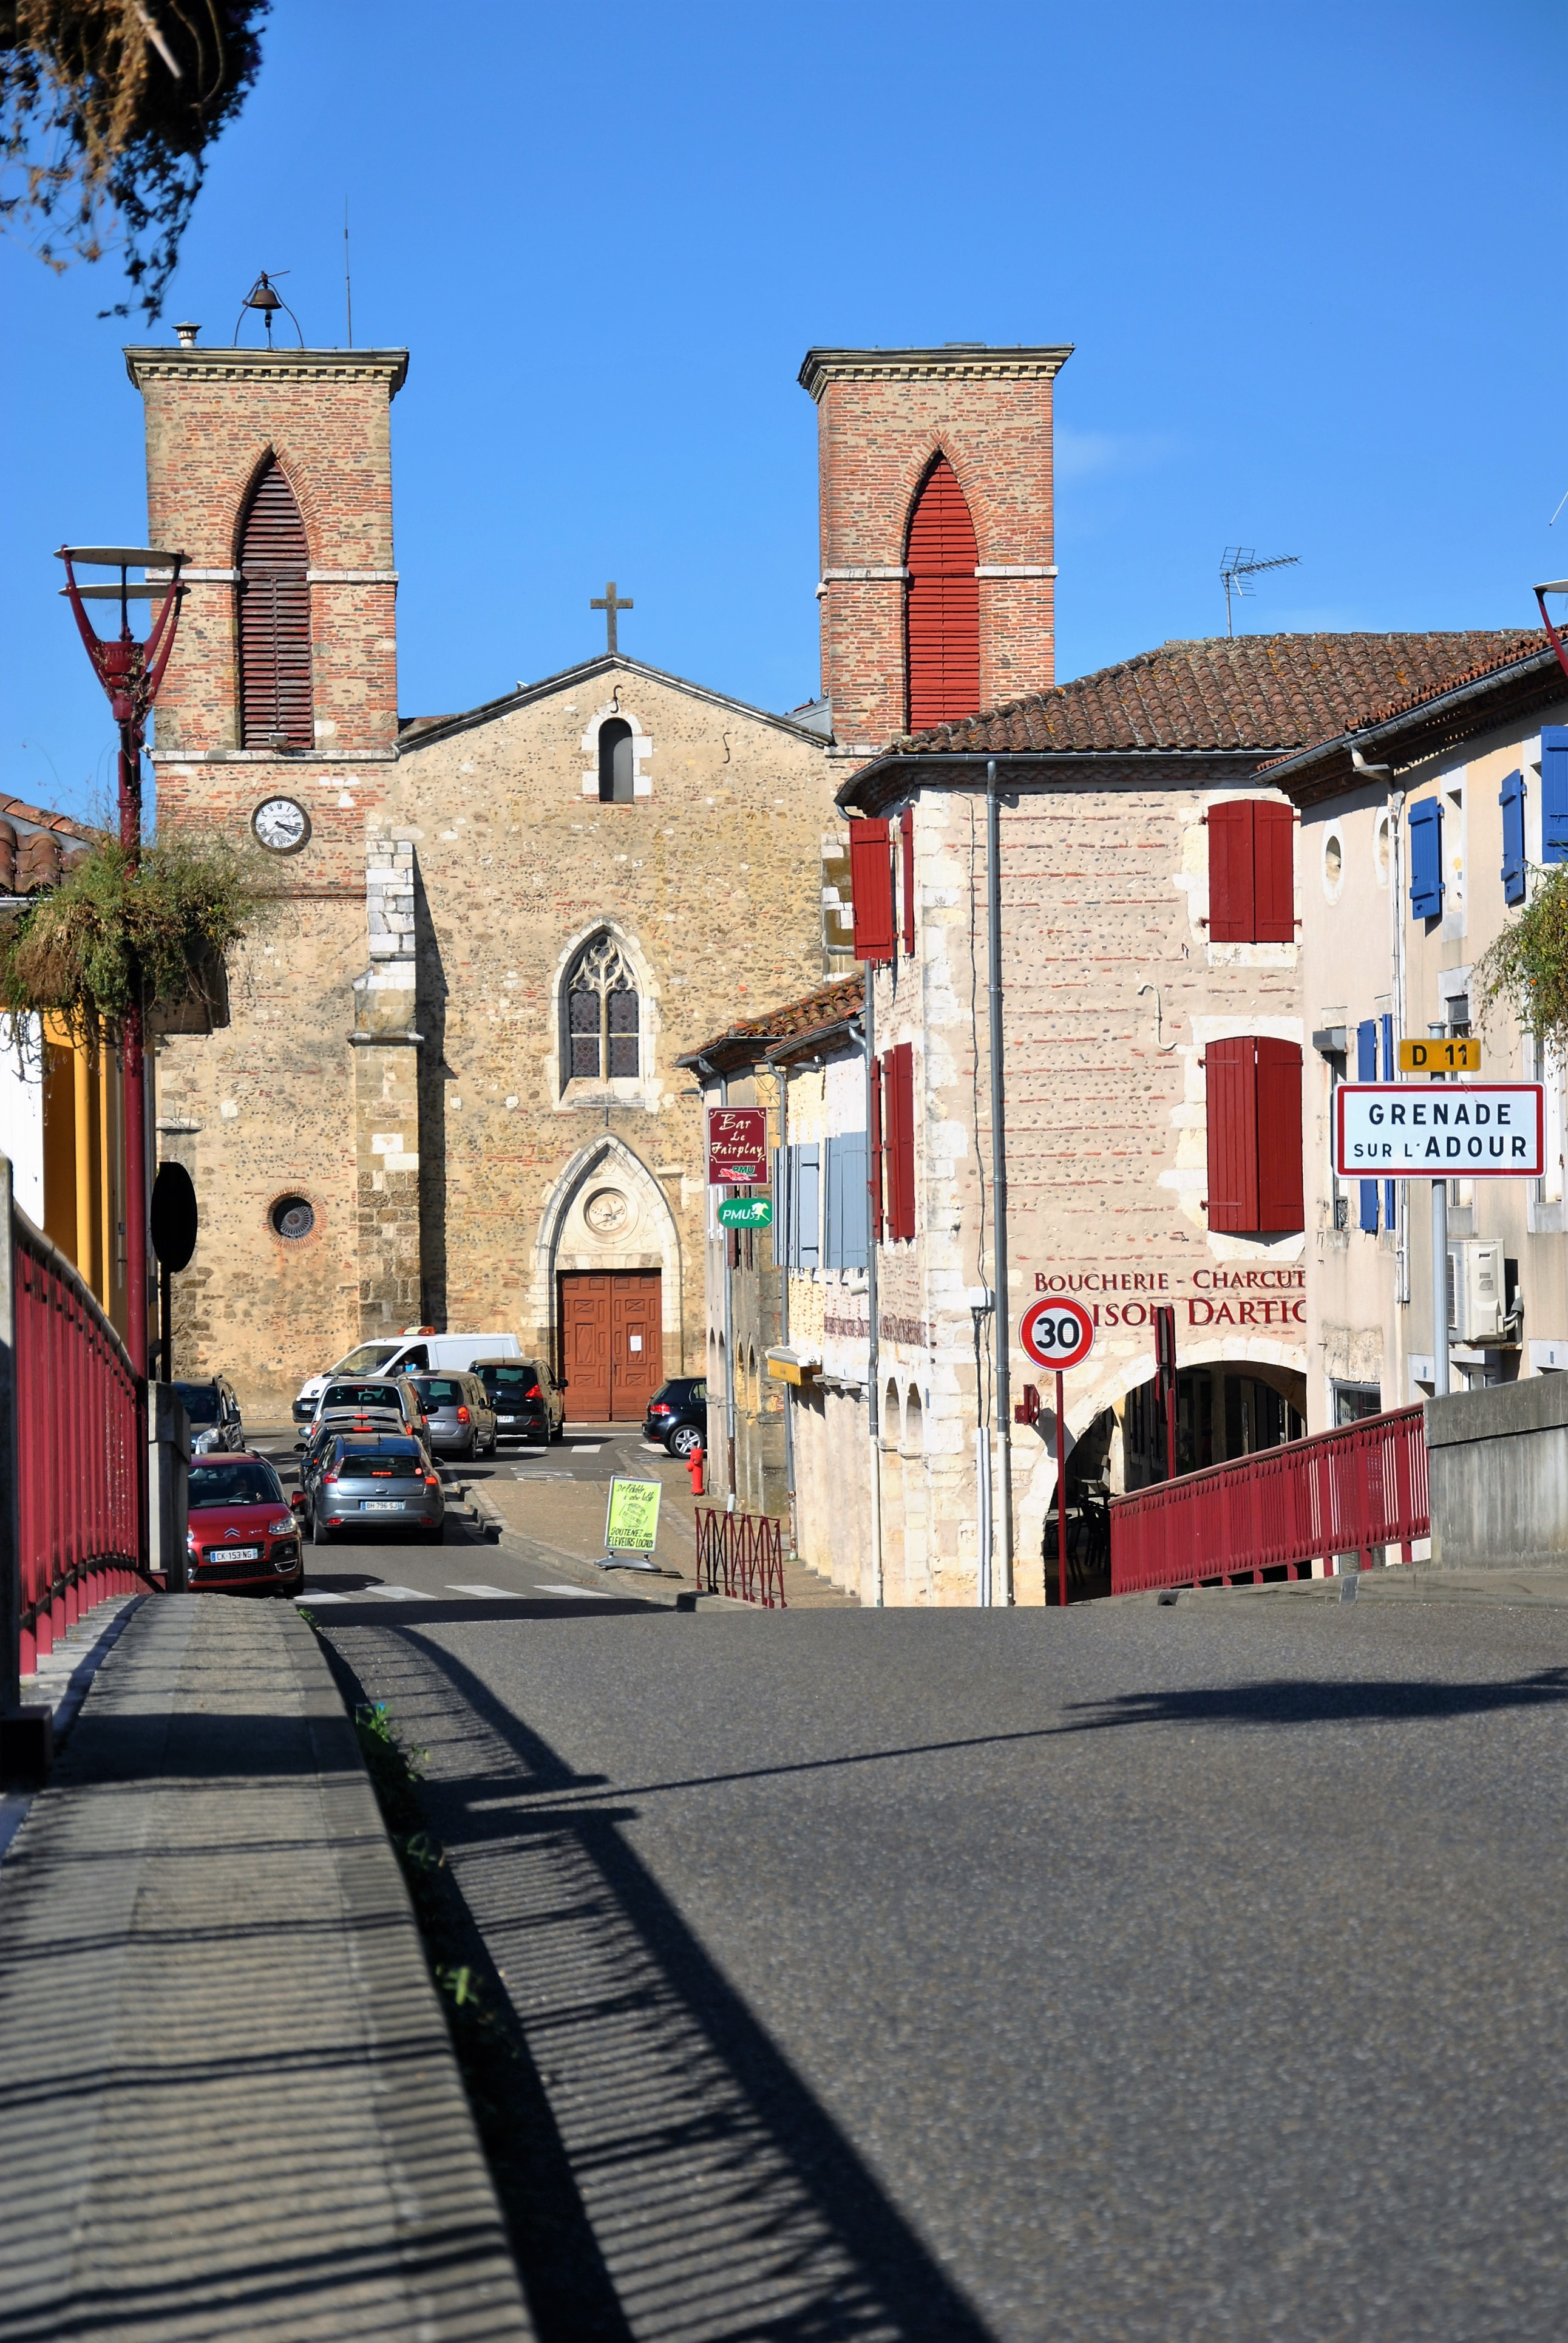 Eglise St Pierre - St Paul du Marsan